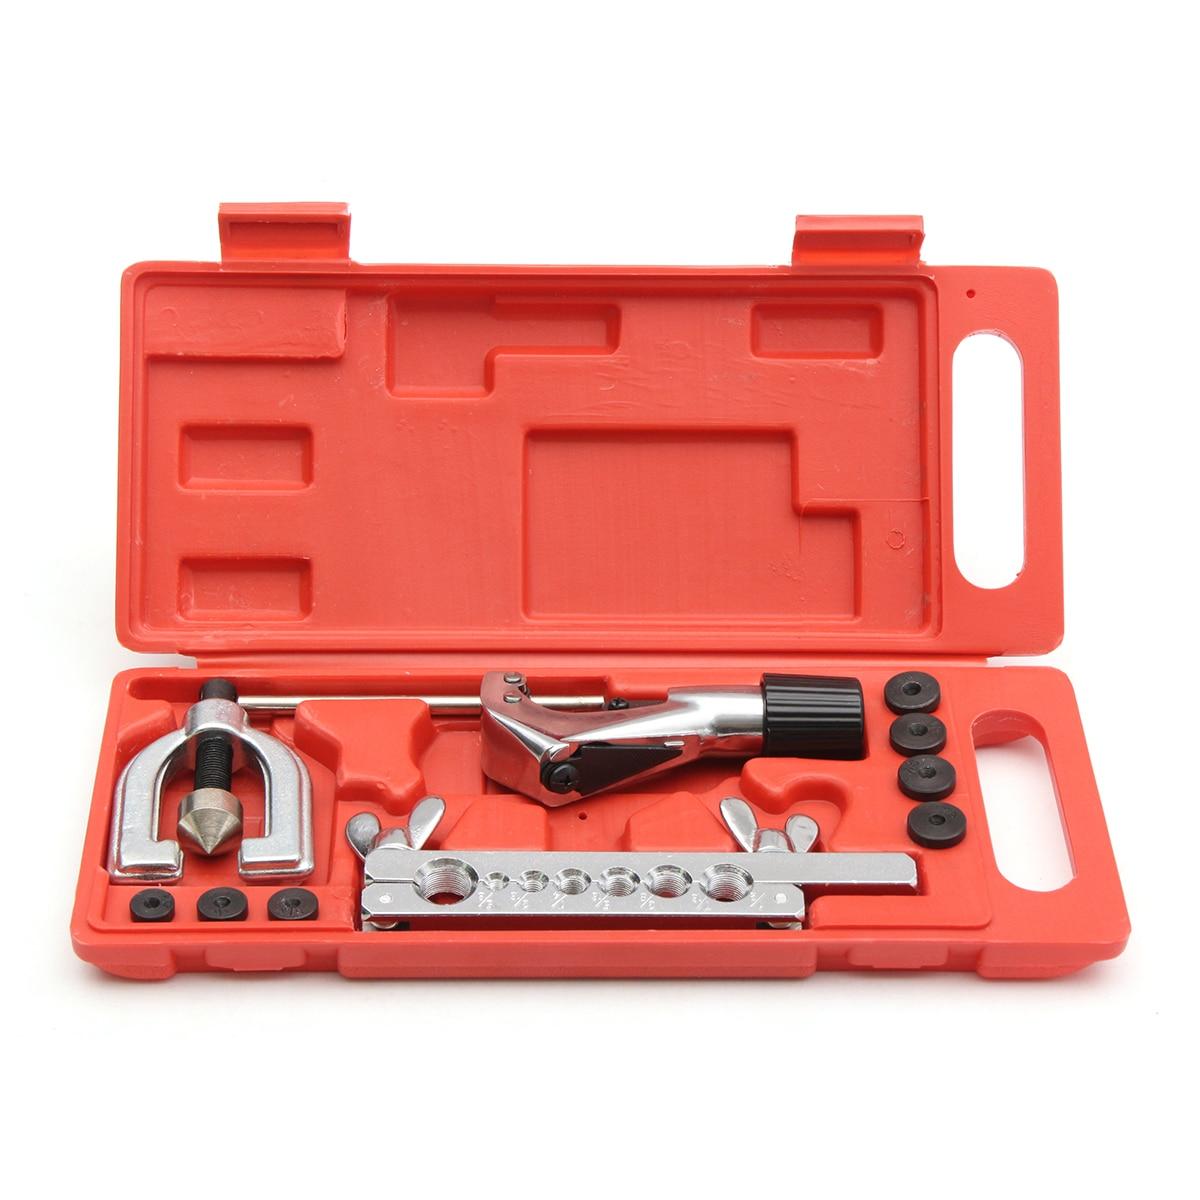 11pcs Steel Brake Fuel Pipe Repair Double Flaring Dies Tool Set Clamp Kit Tube Cutter Bending Tool Set Pipe Flaring Kit цена